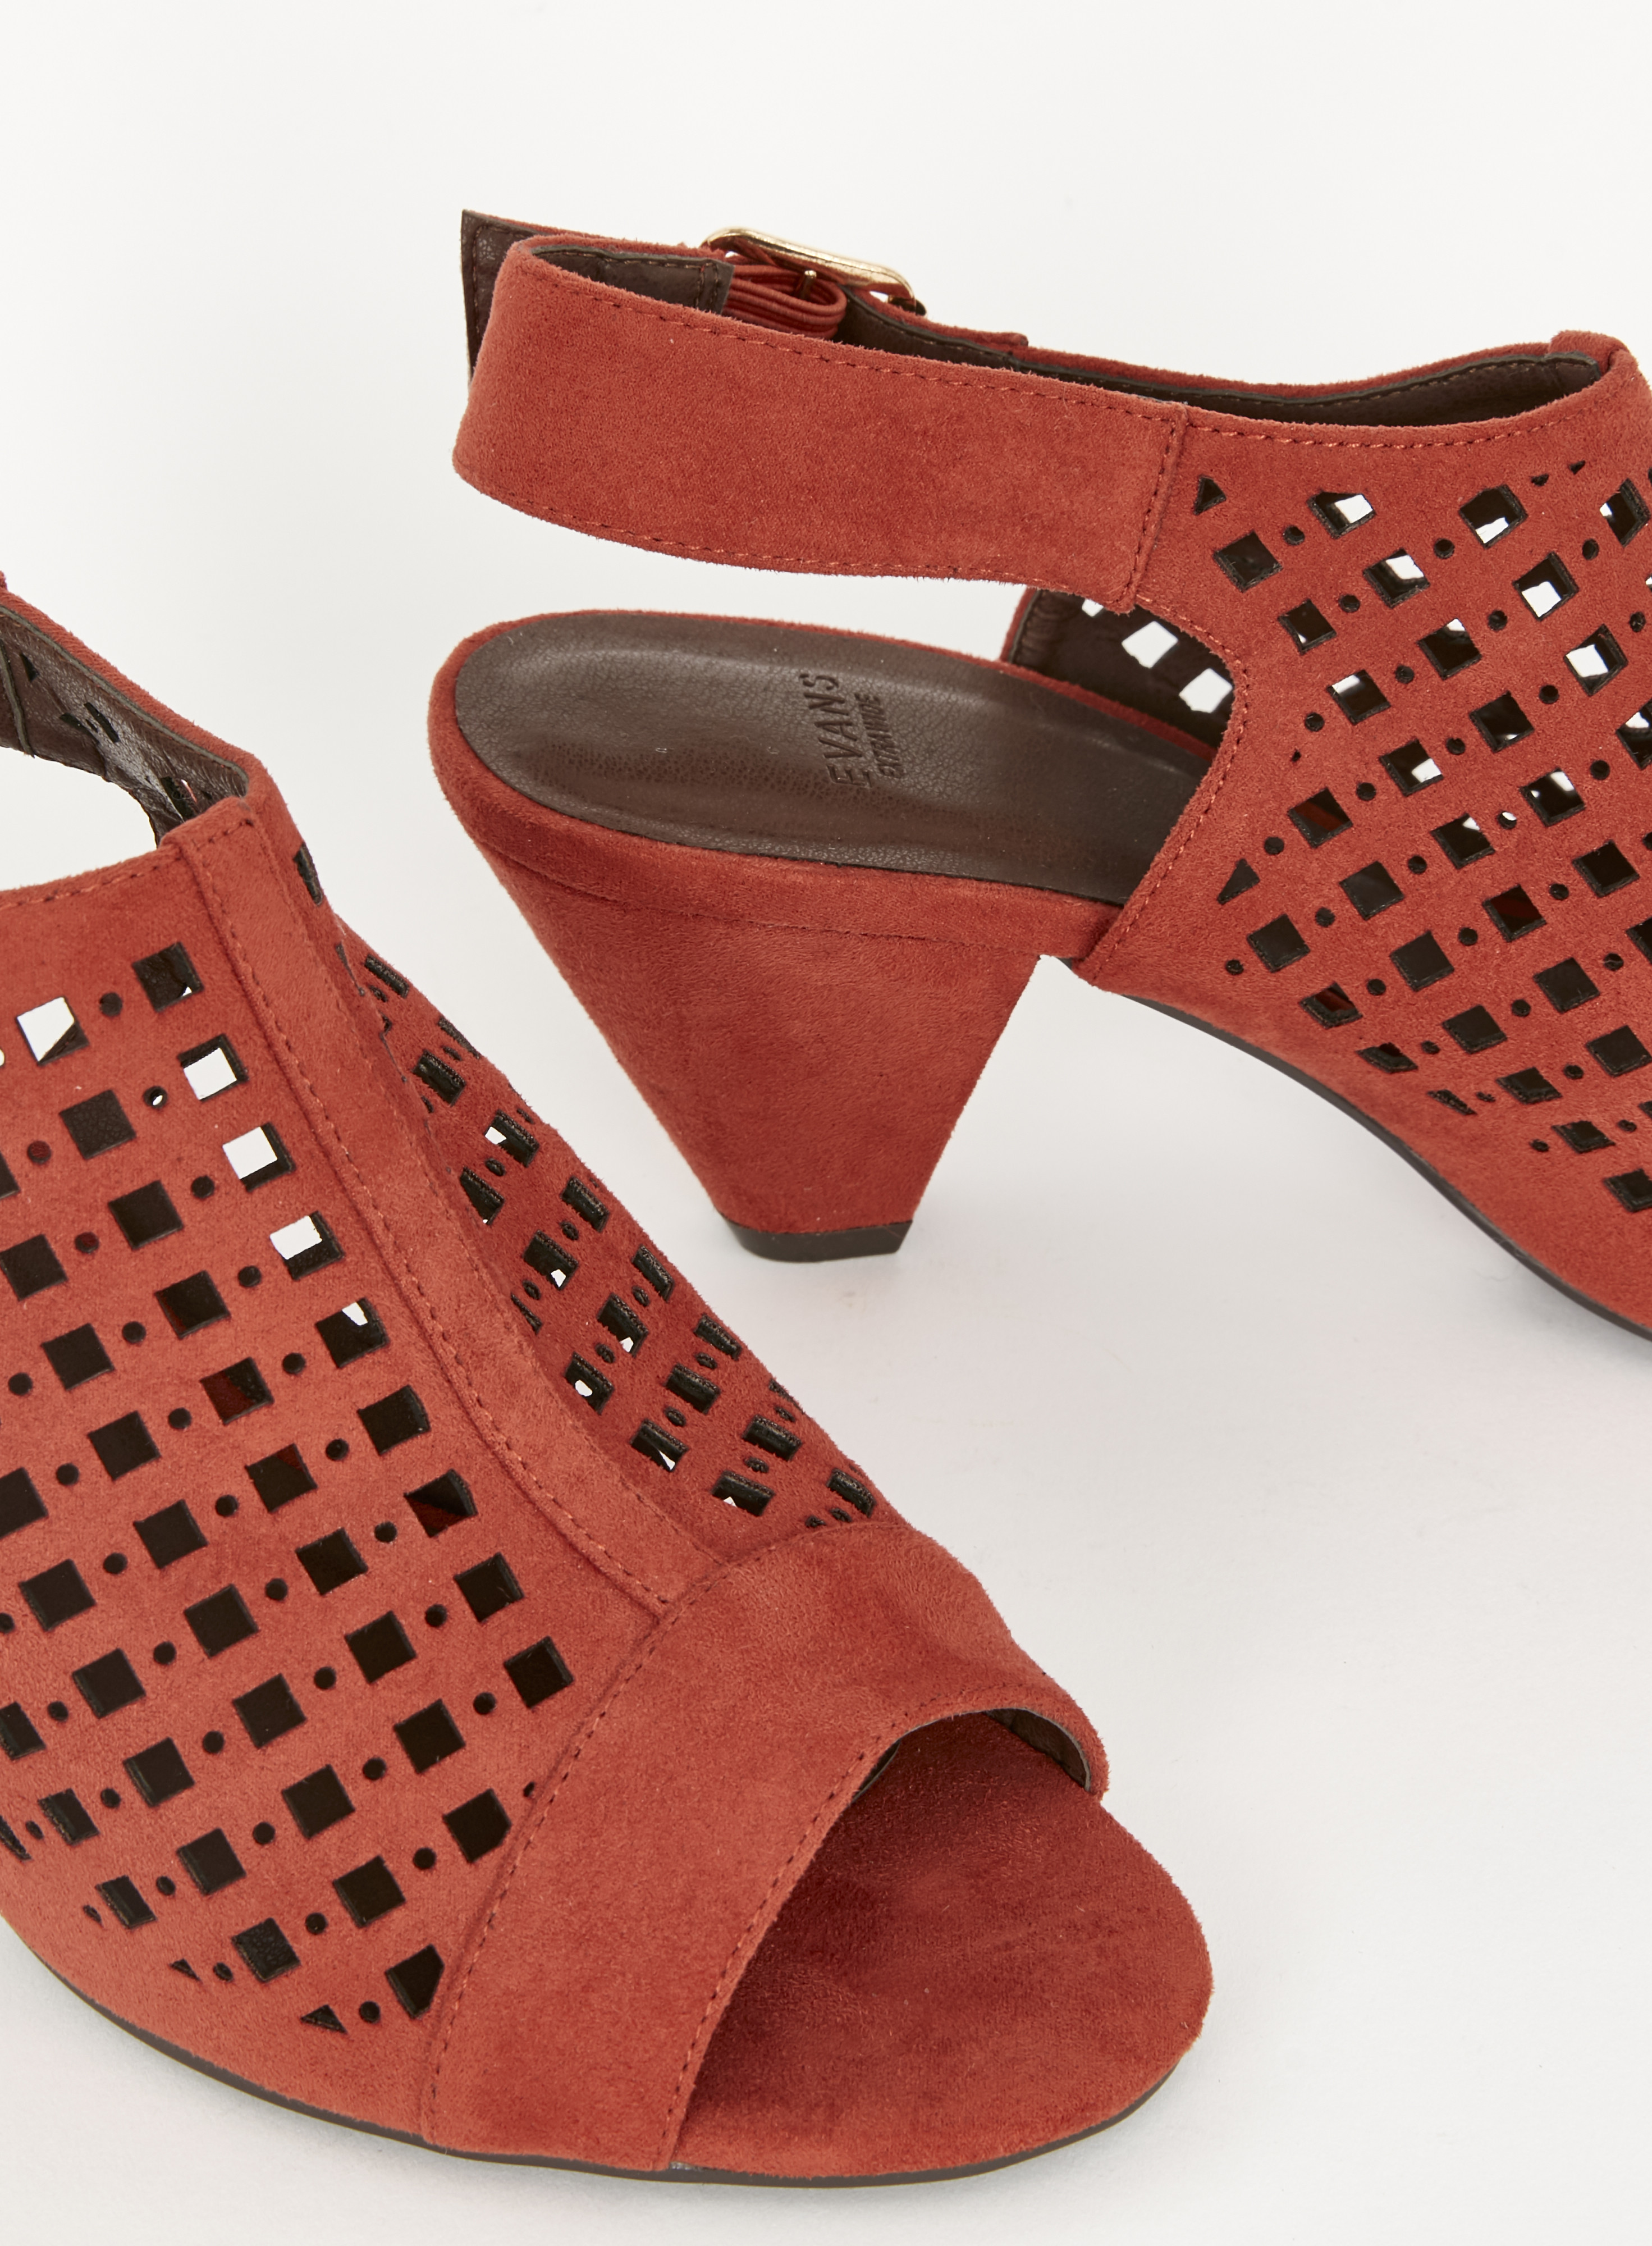 Large Size Ladies EVANS Rust CutOut Slingback Cone Shoes PLUS SIZE UK9 EEE HABIB